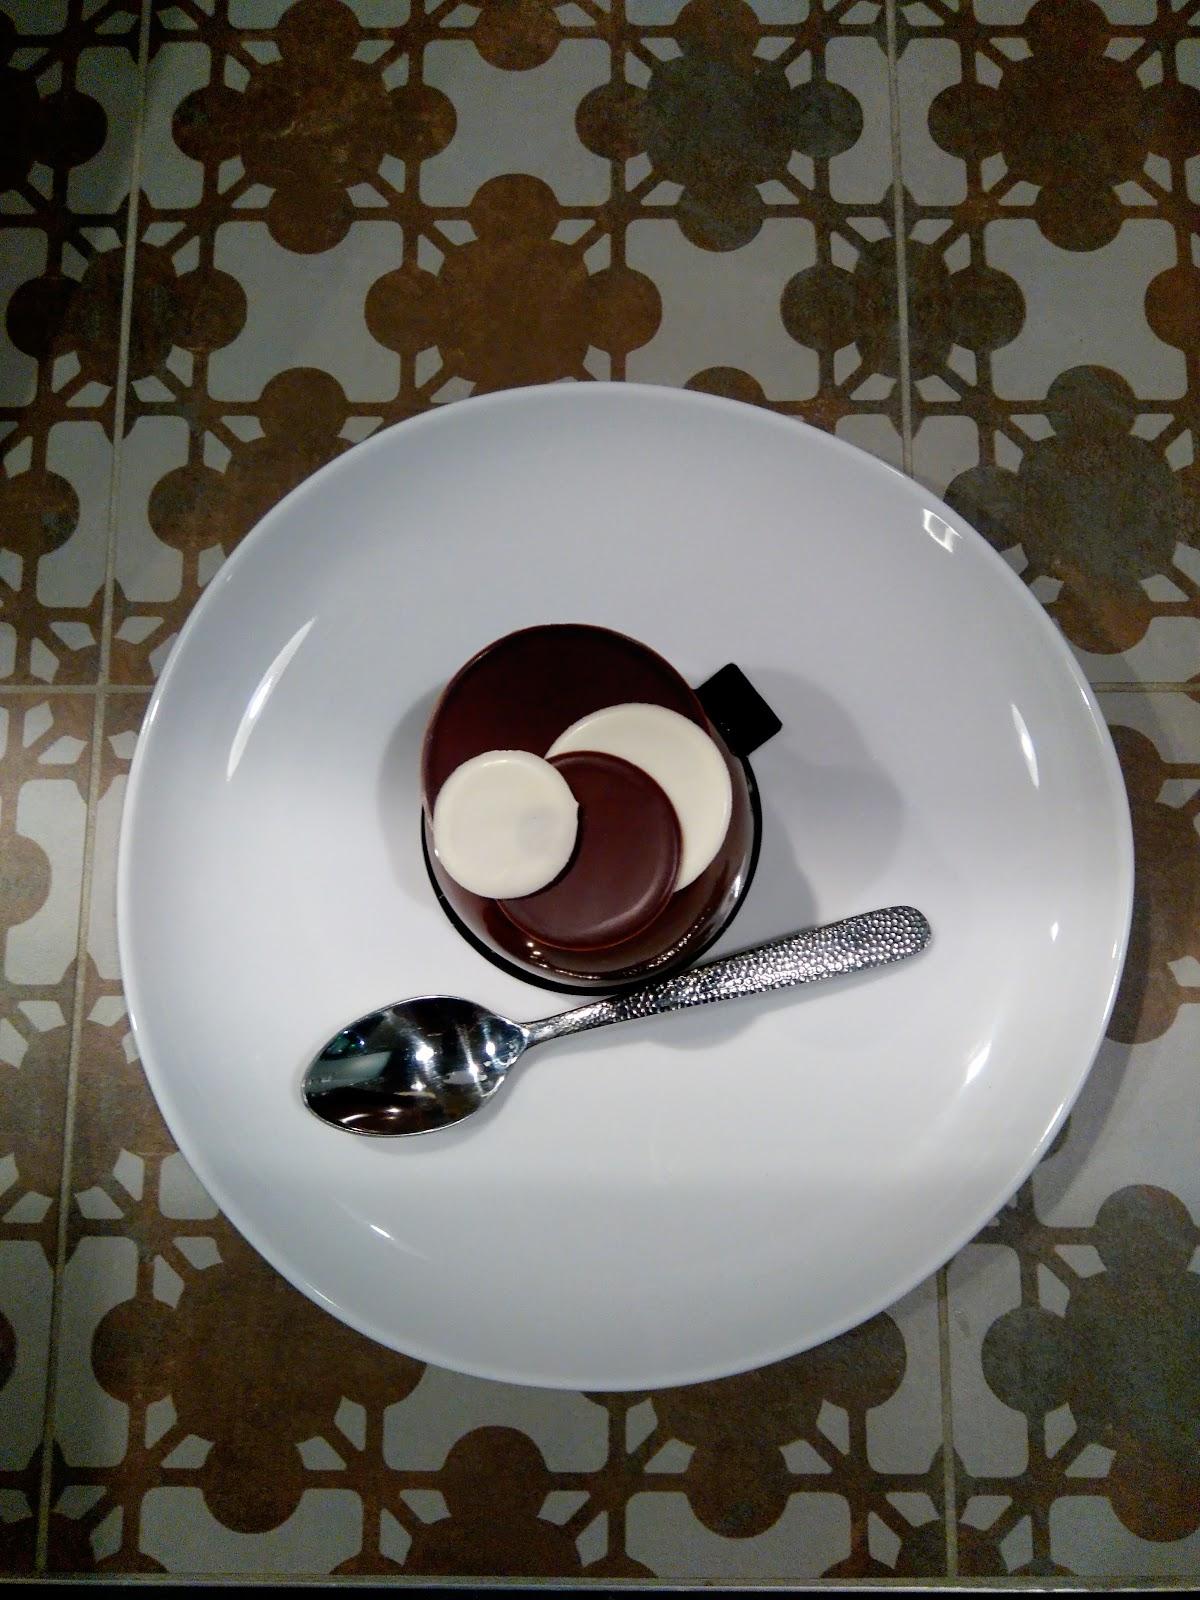 Patisserie sans gluten saint germain en laye